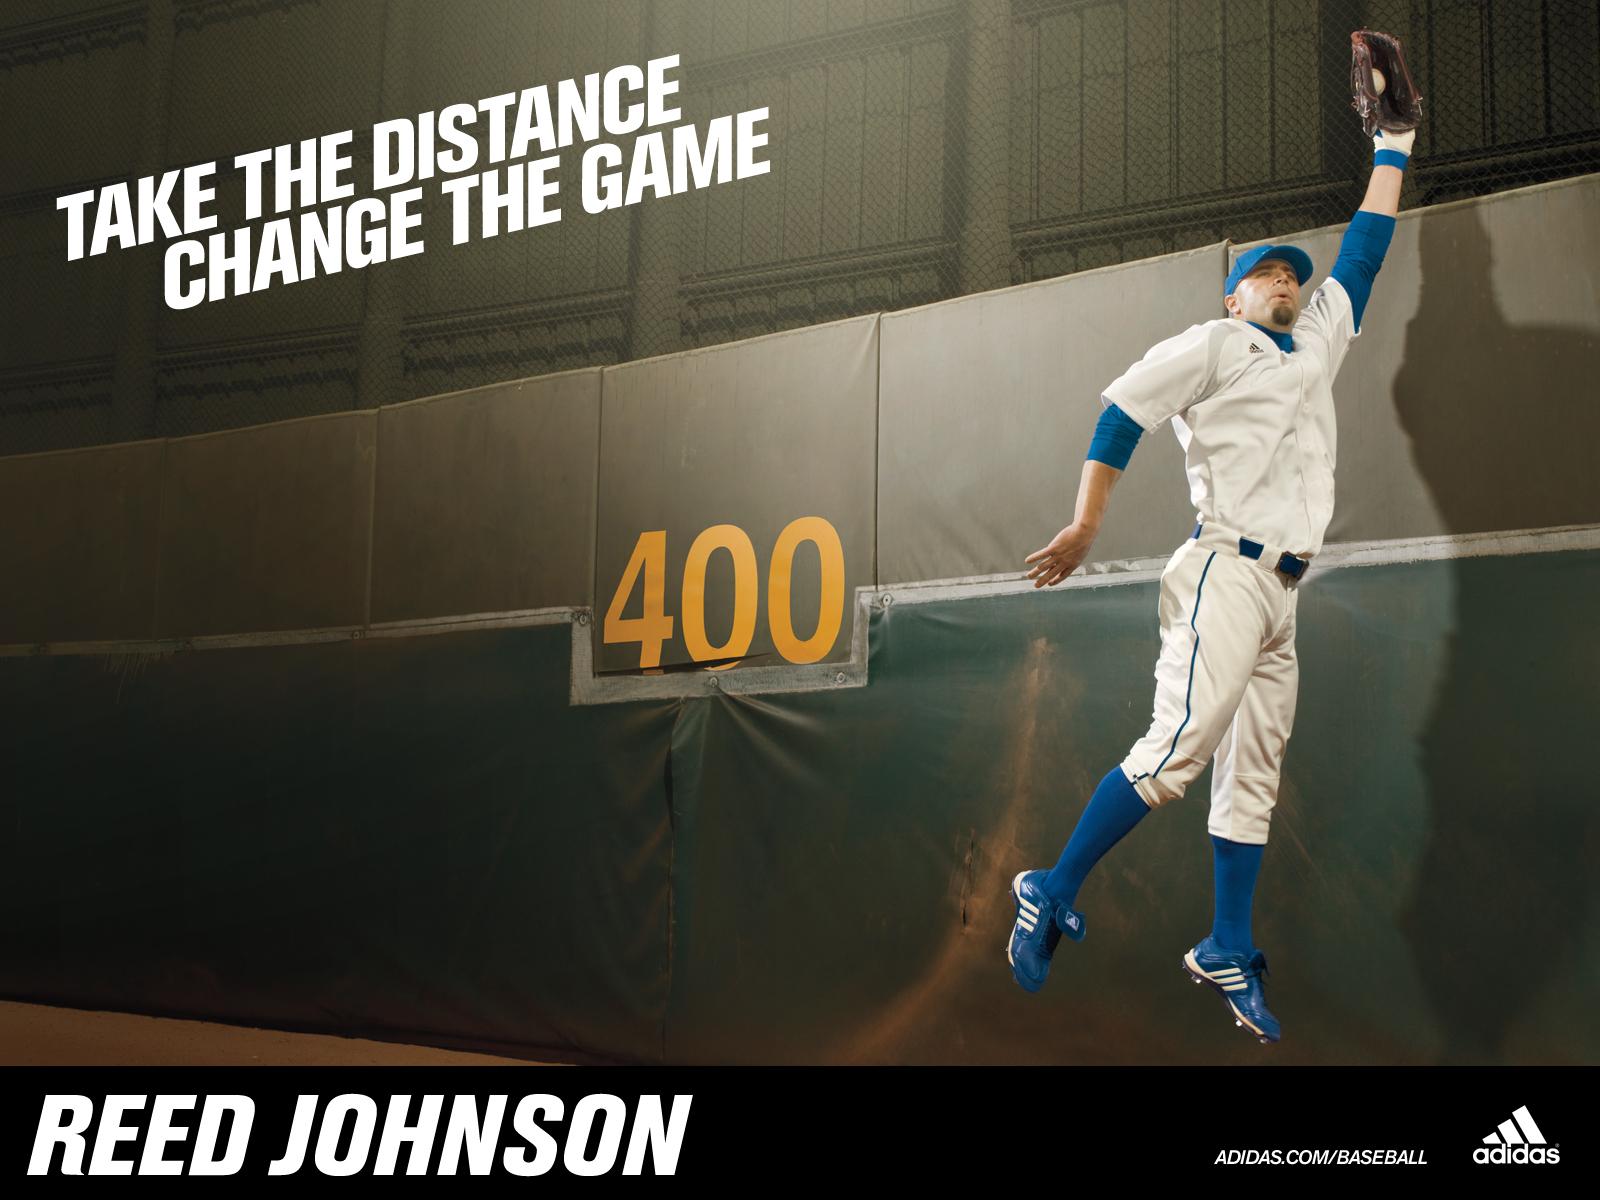 1600x1200_WP_REED_JOHNSON.jpg